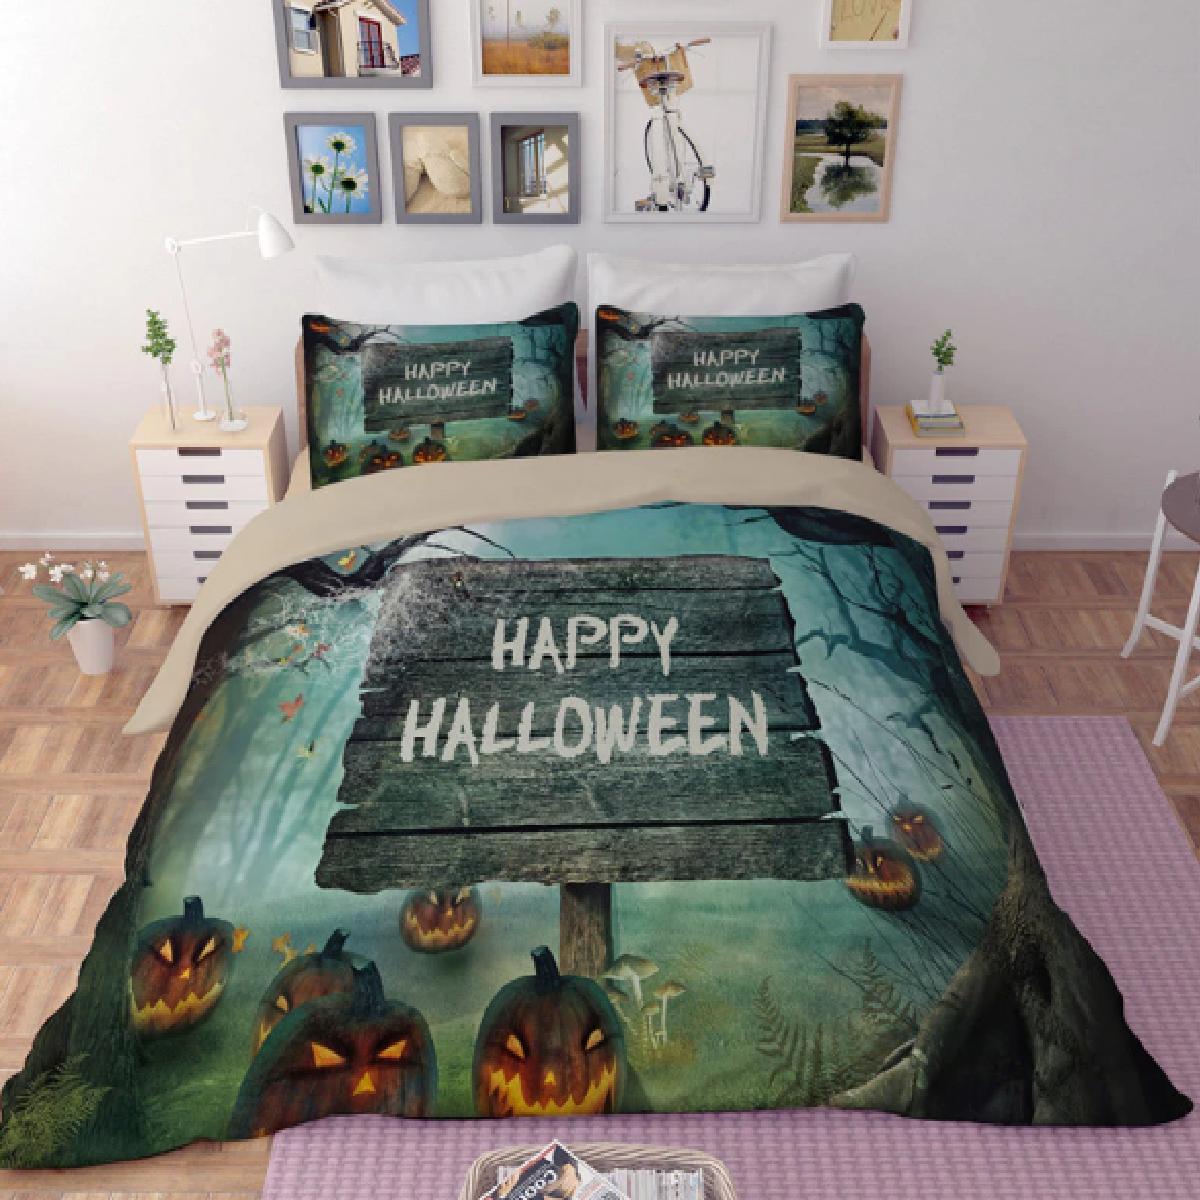 Happy Halloween pumpkin Land Duvet Bedding Set